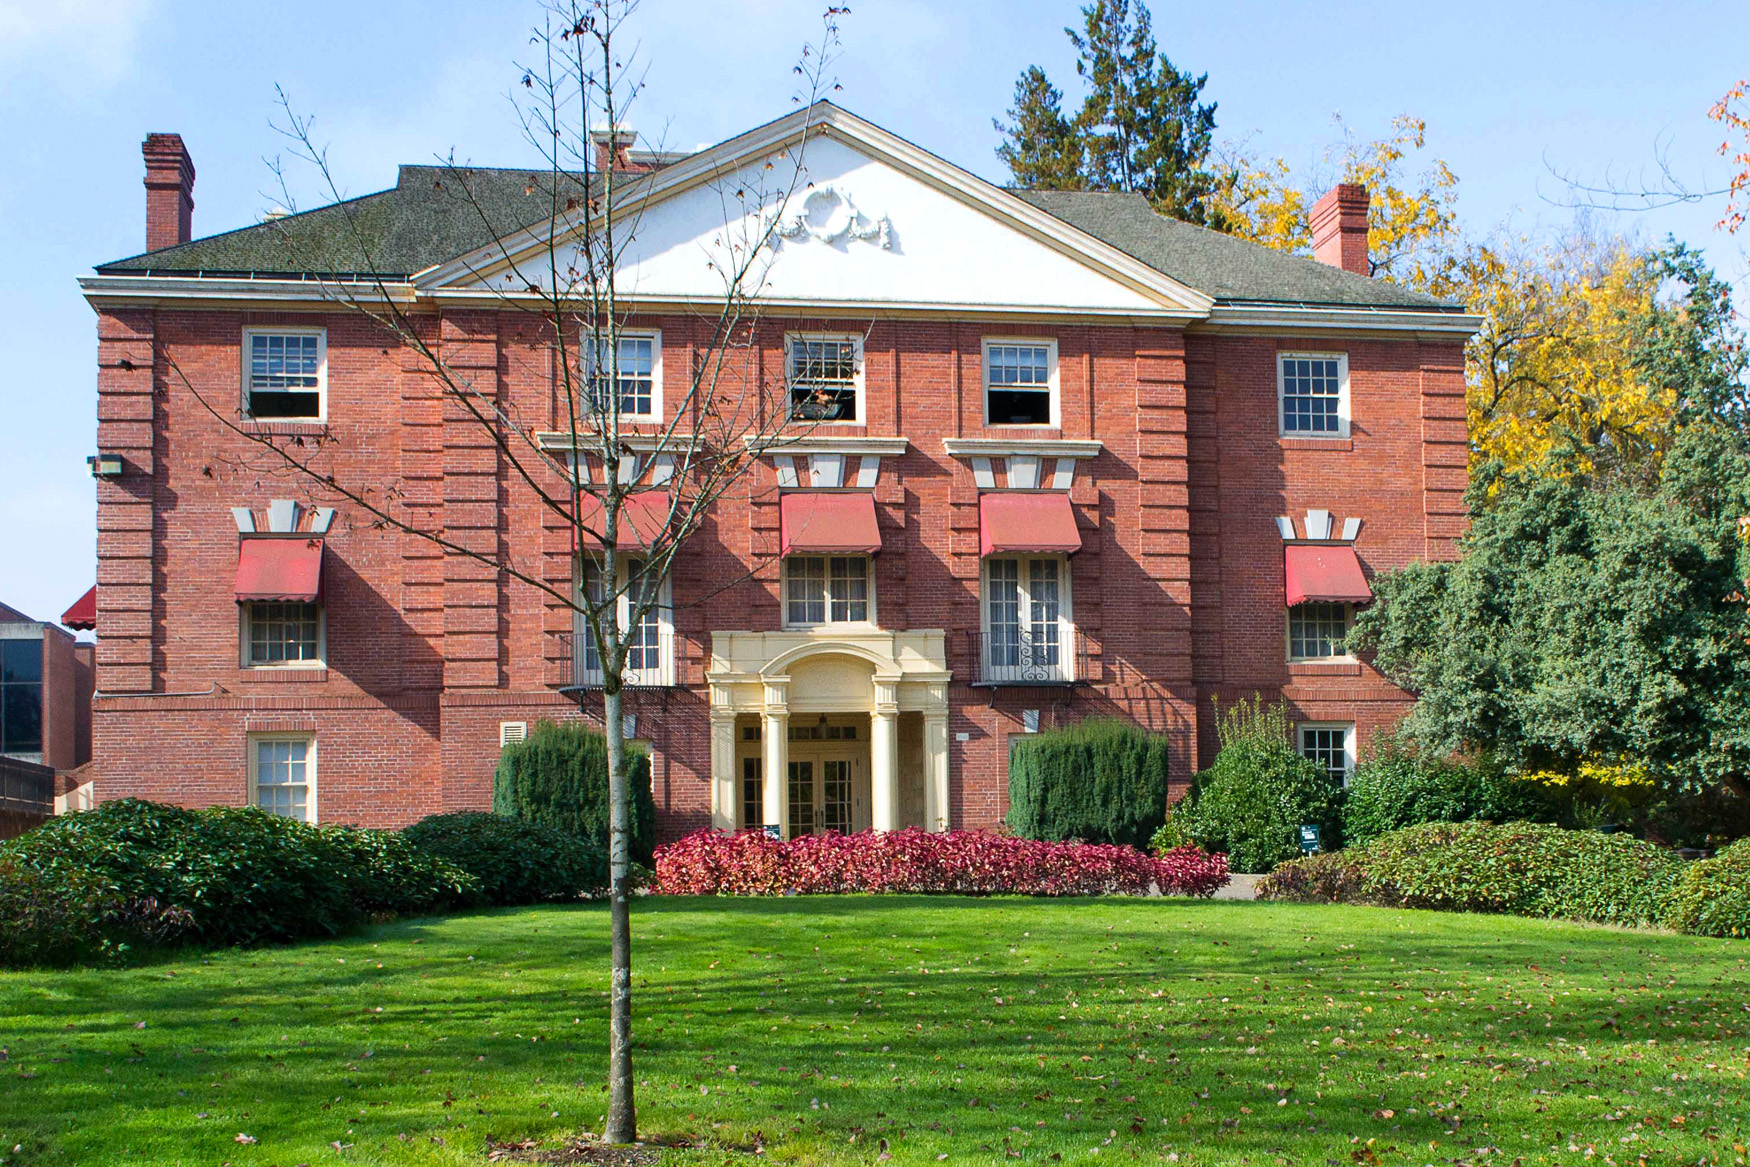 National Lampoon S Animal House Filming Location Gerlinger Hall Women Memorial Quadrangle University Of